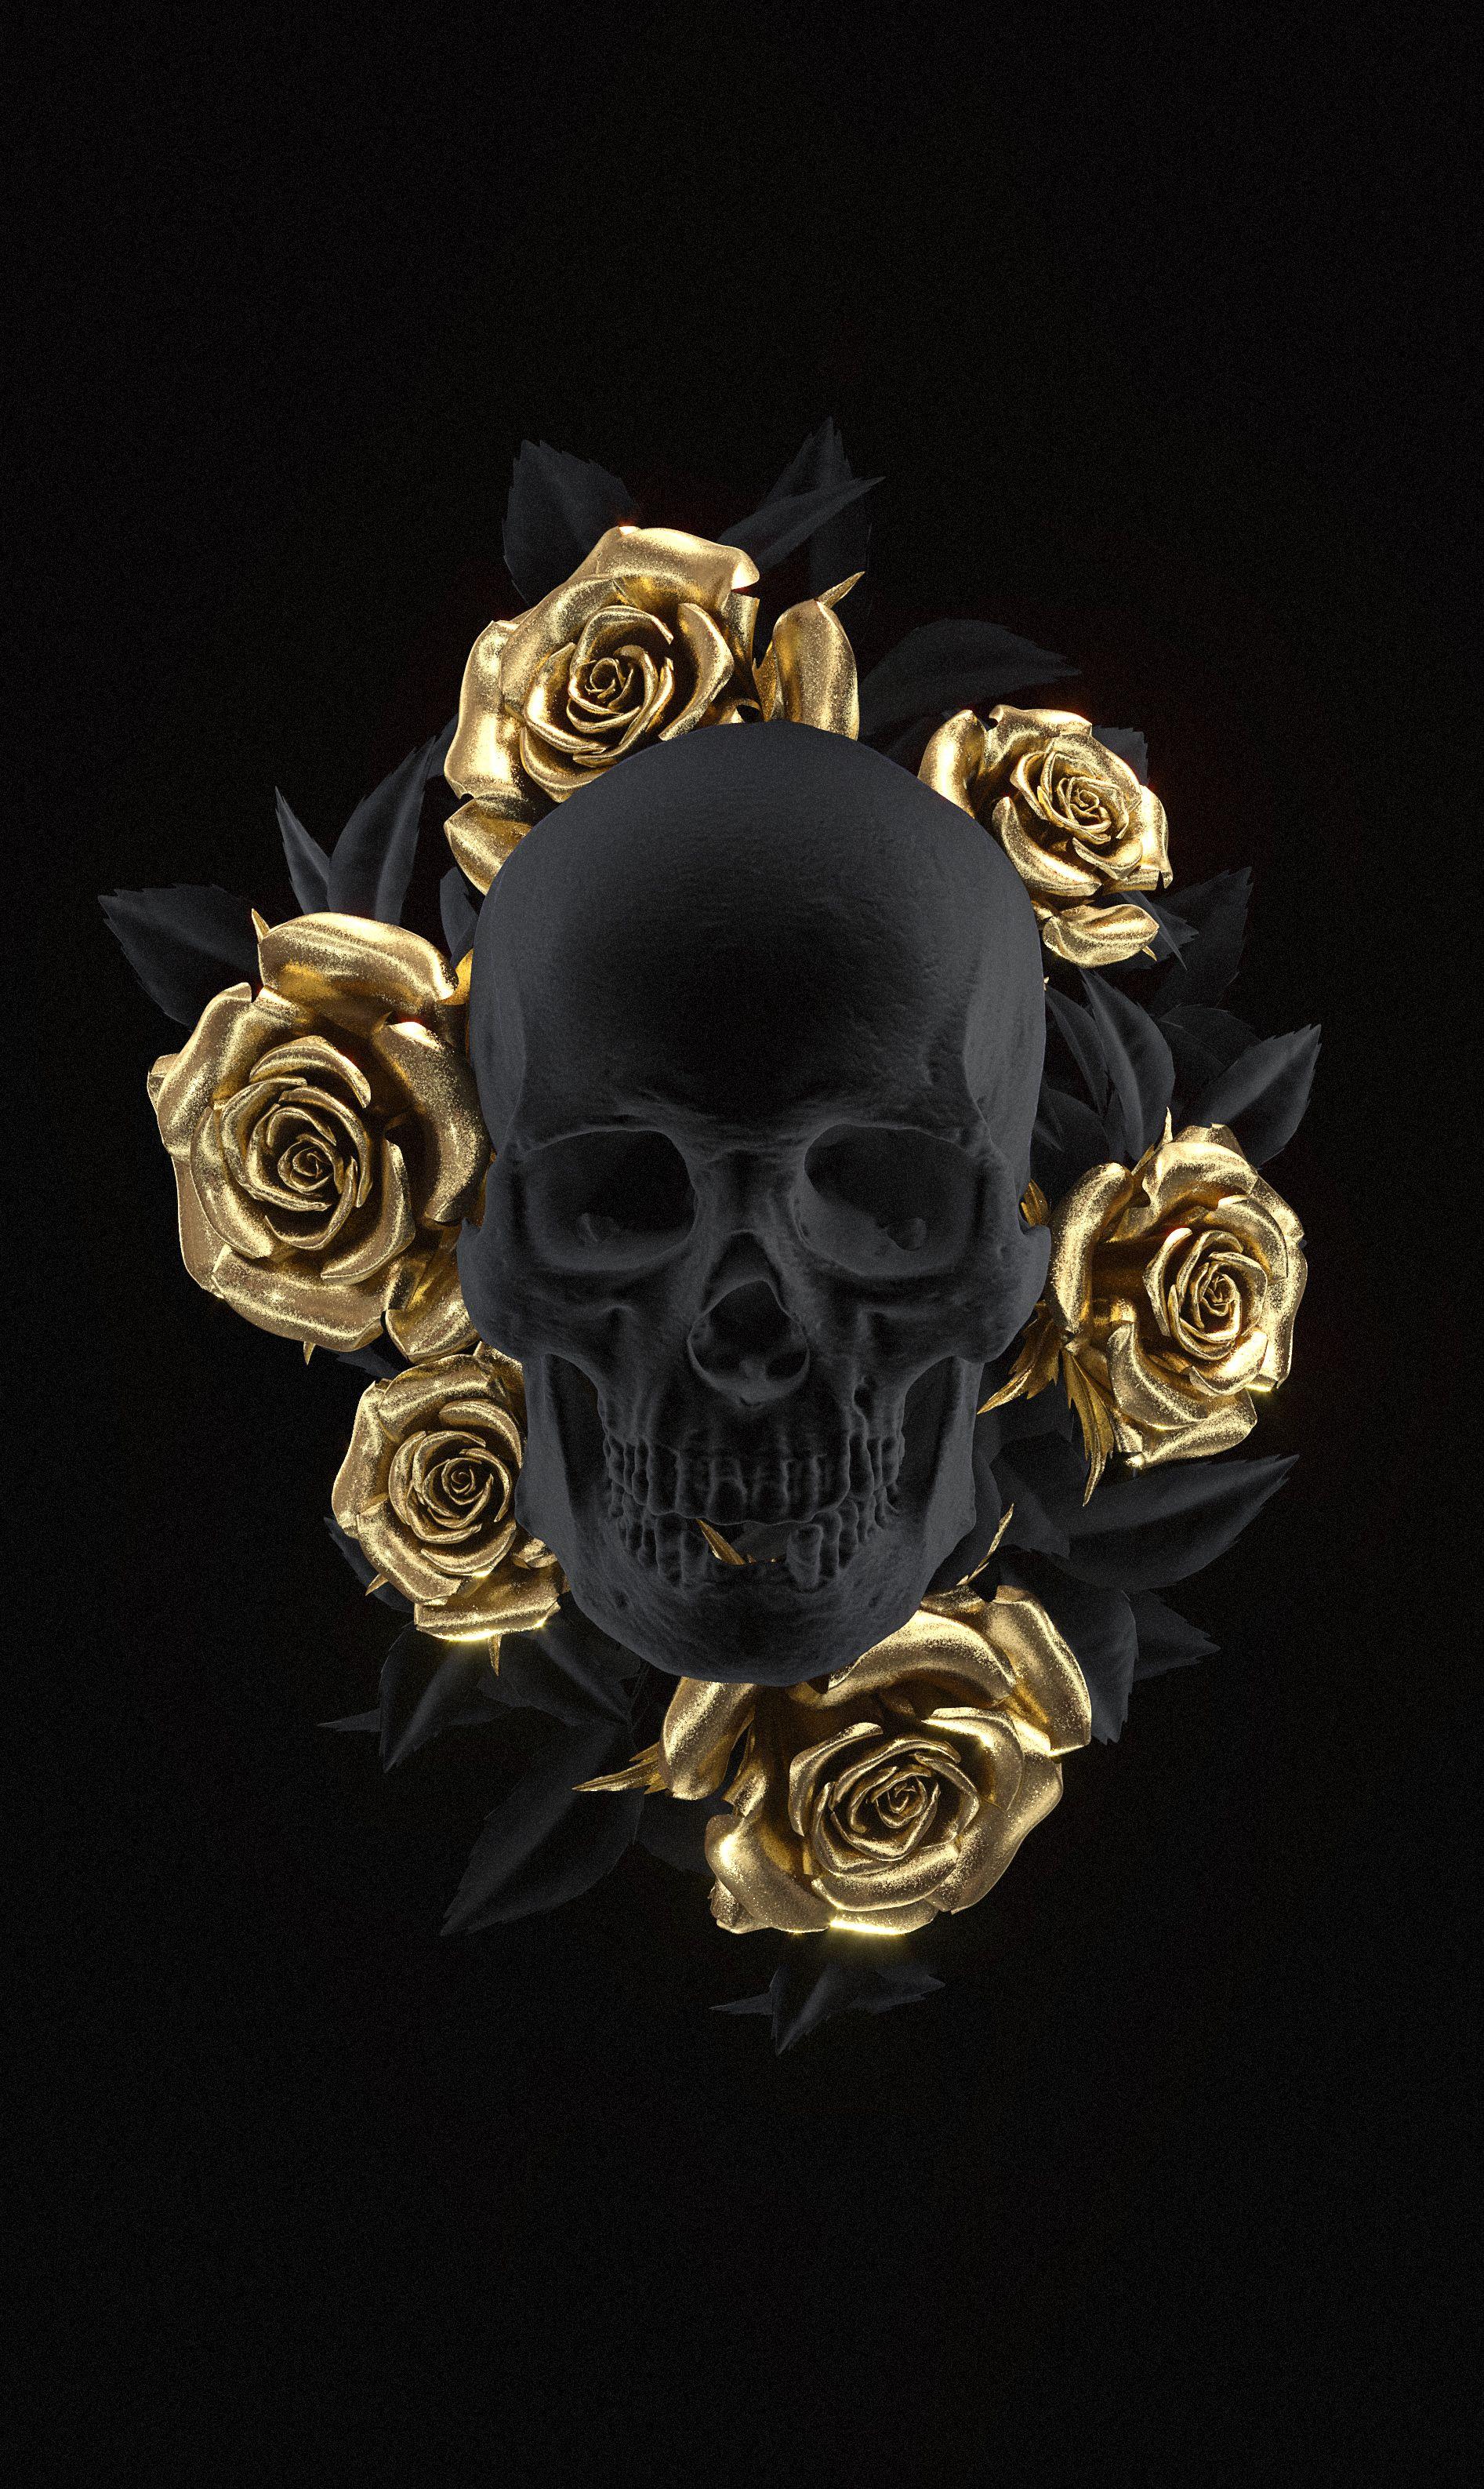 Skull Art by UK artist Billelis